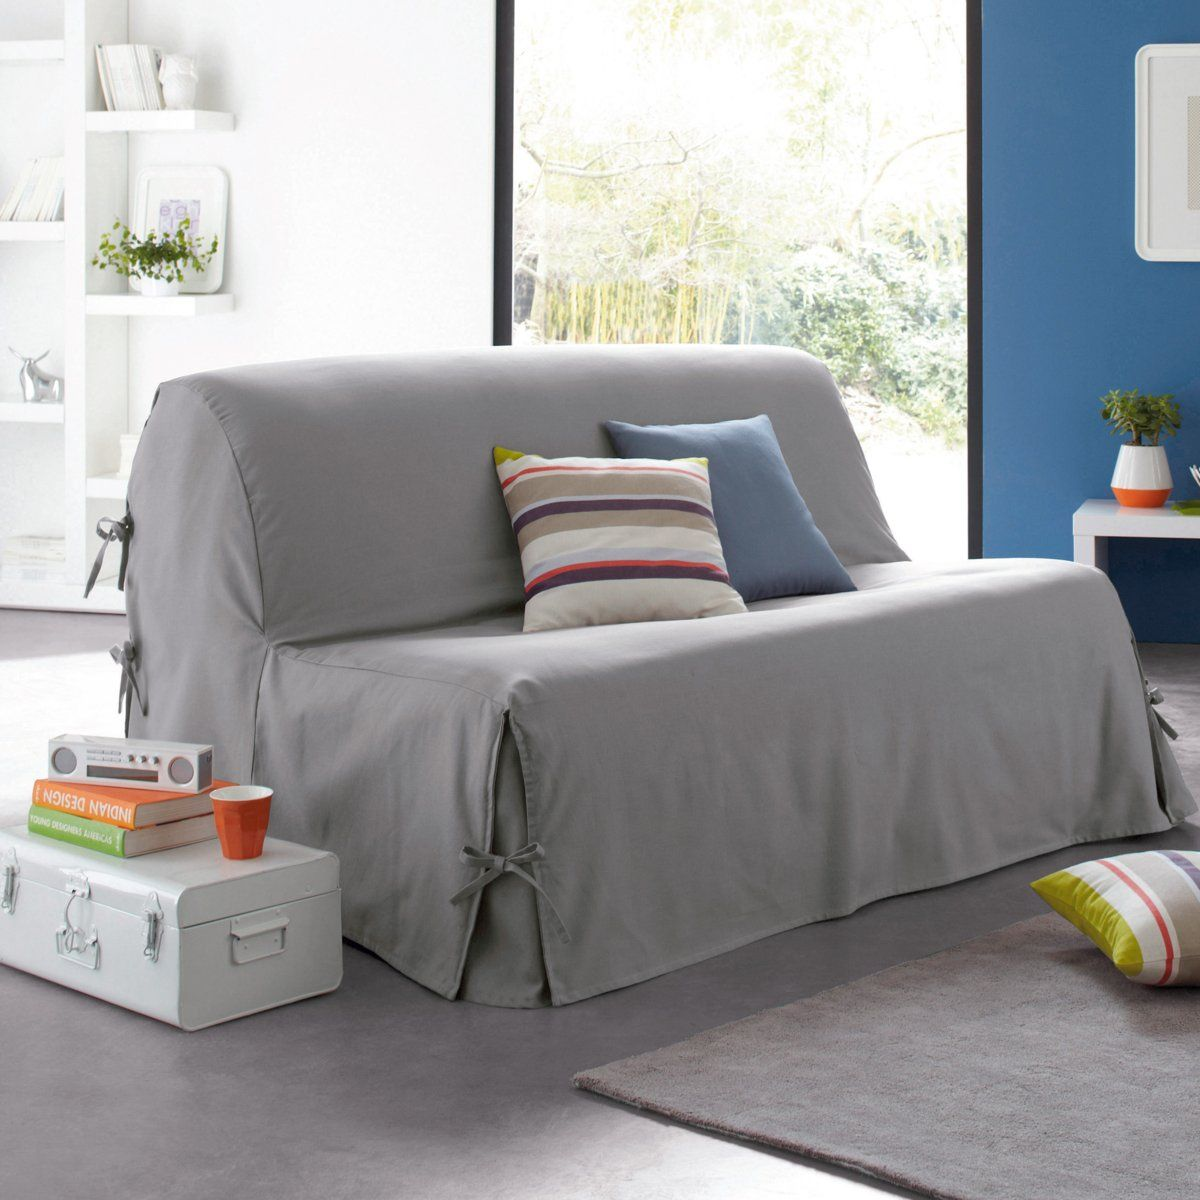 funda para sof cama tipo acorde n cojines y decoraci n sala pinterest patron et d co. Black Bedroom Furniture Sets. Home Design Ideas